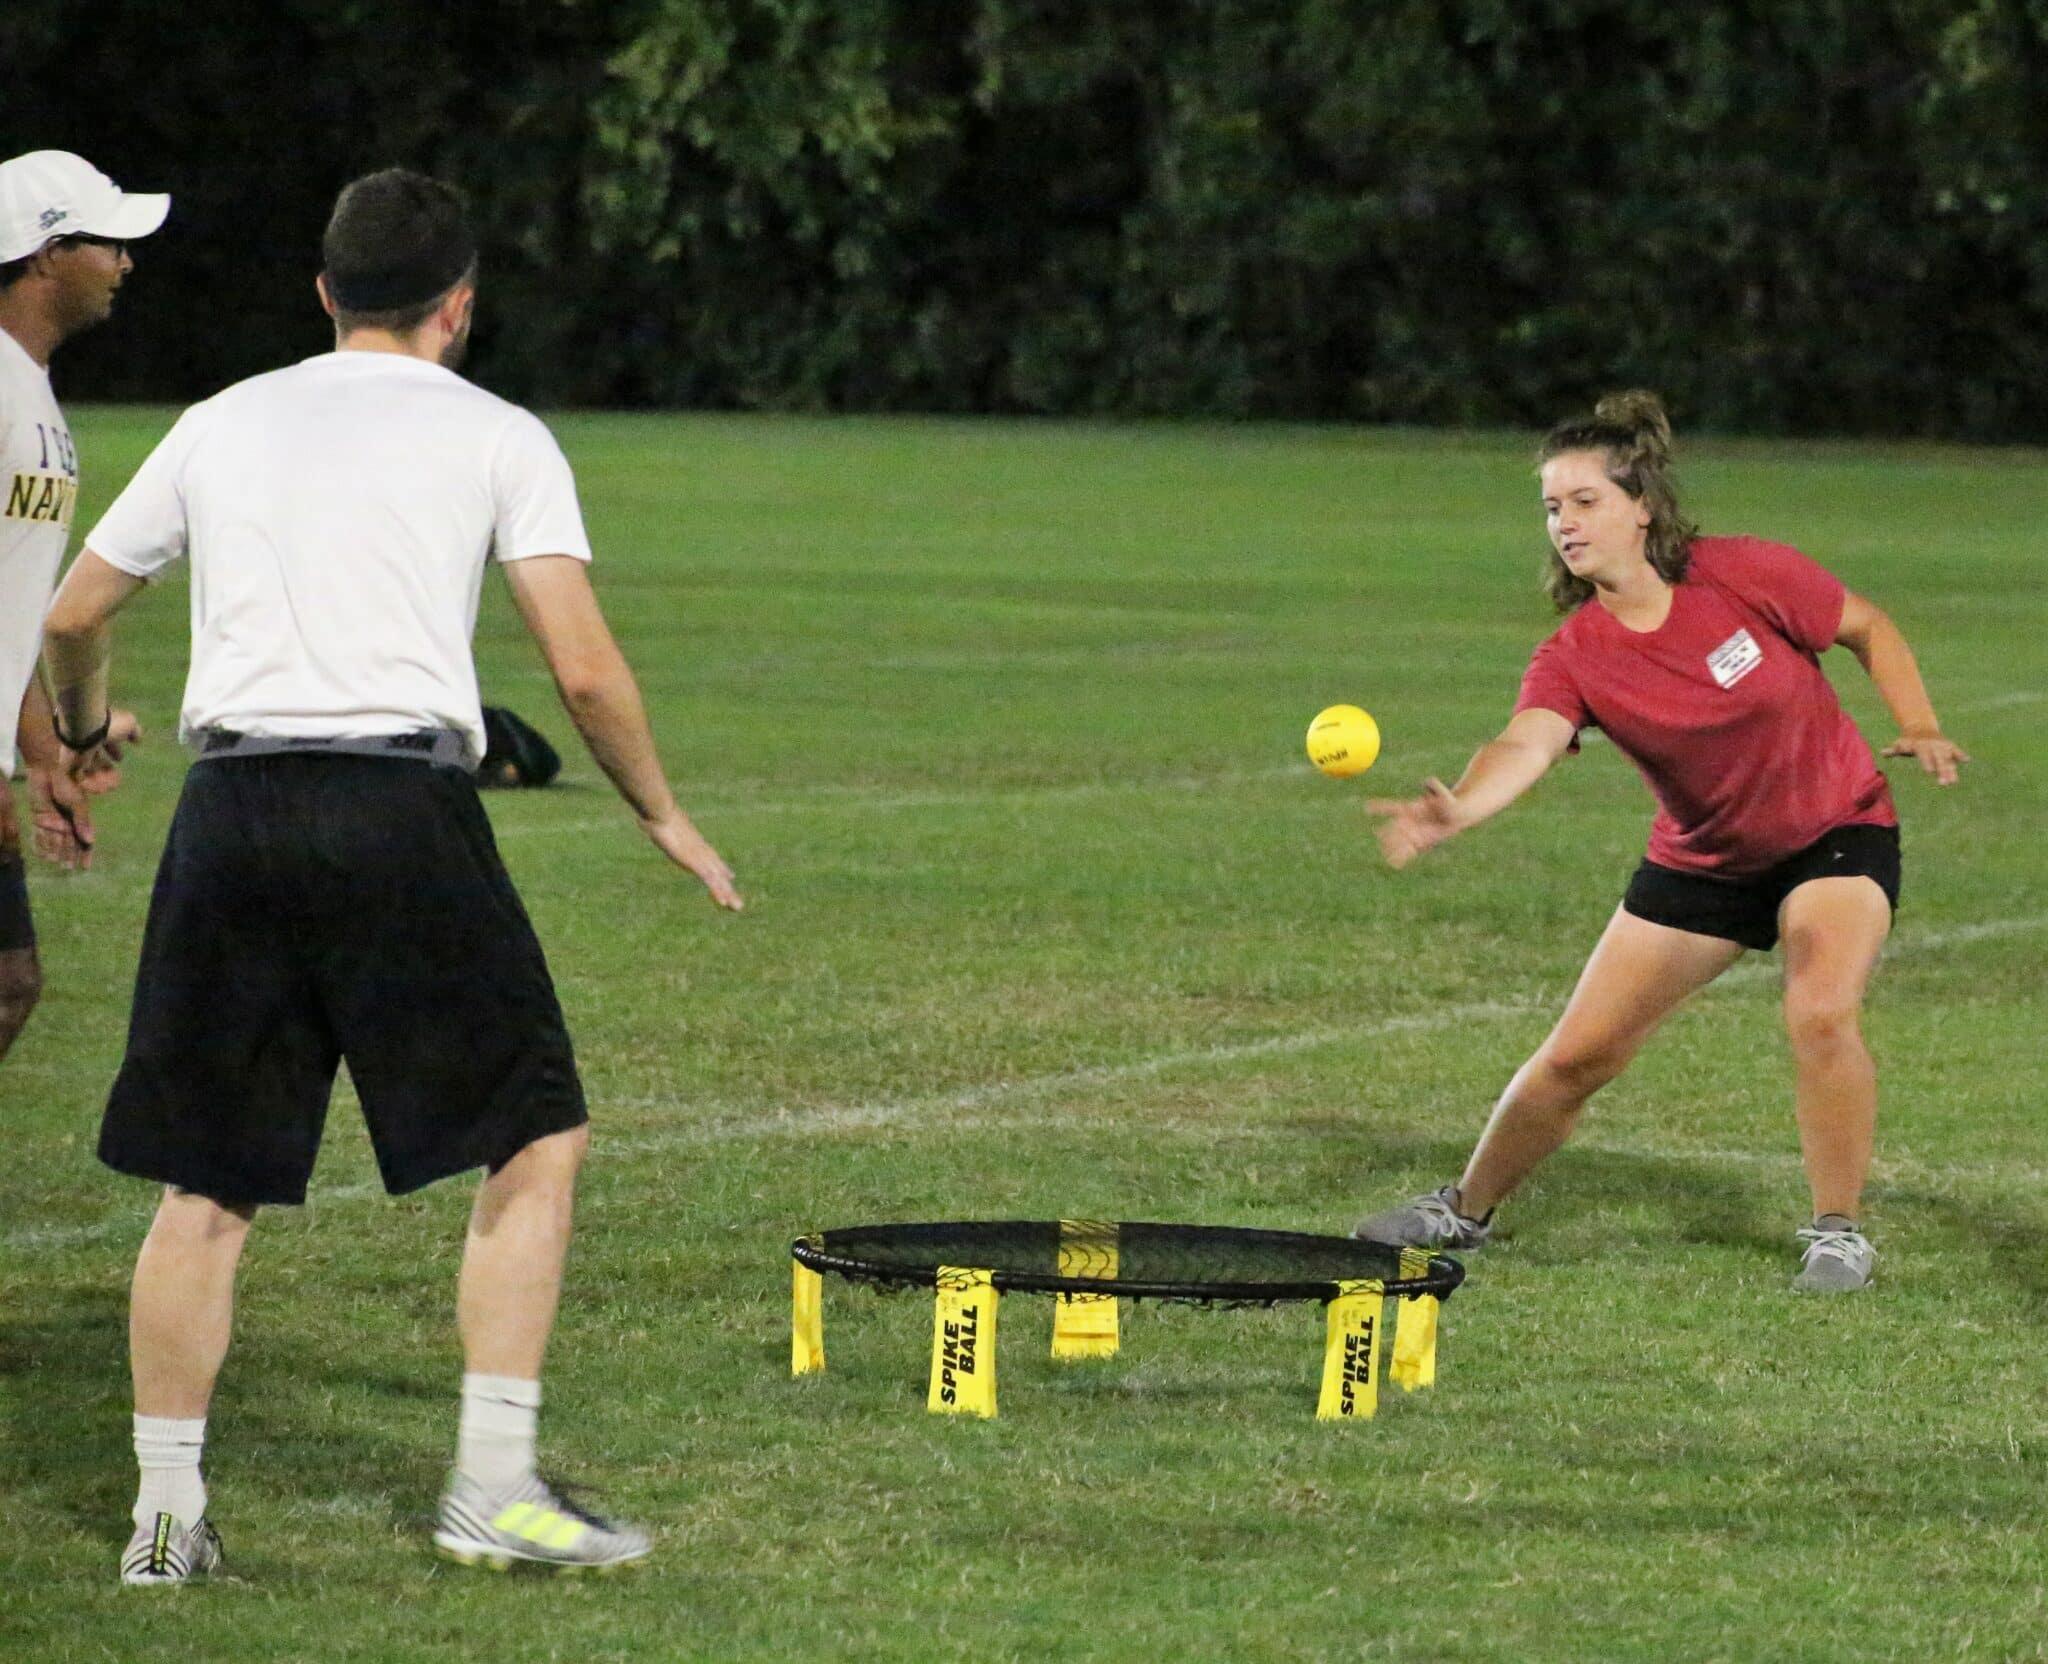 Photo 3 - Spikeball game